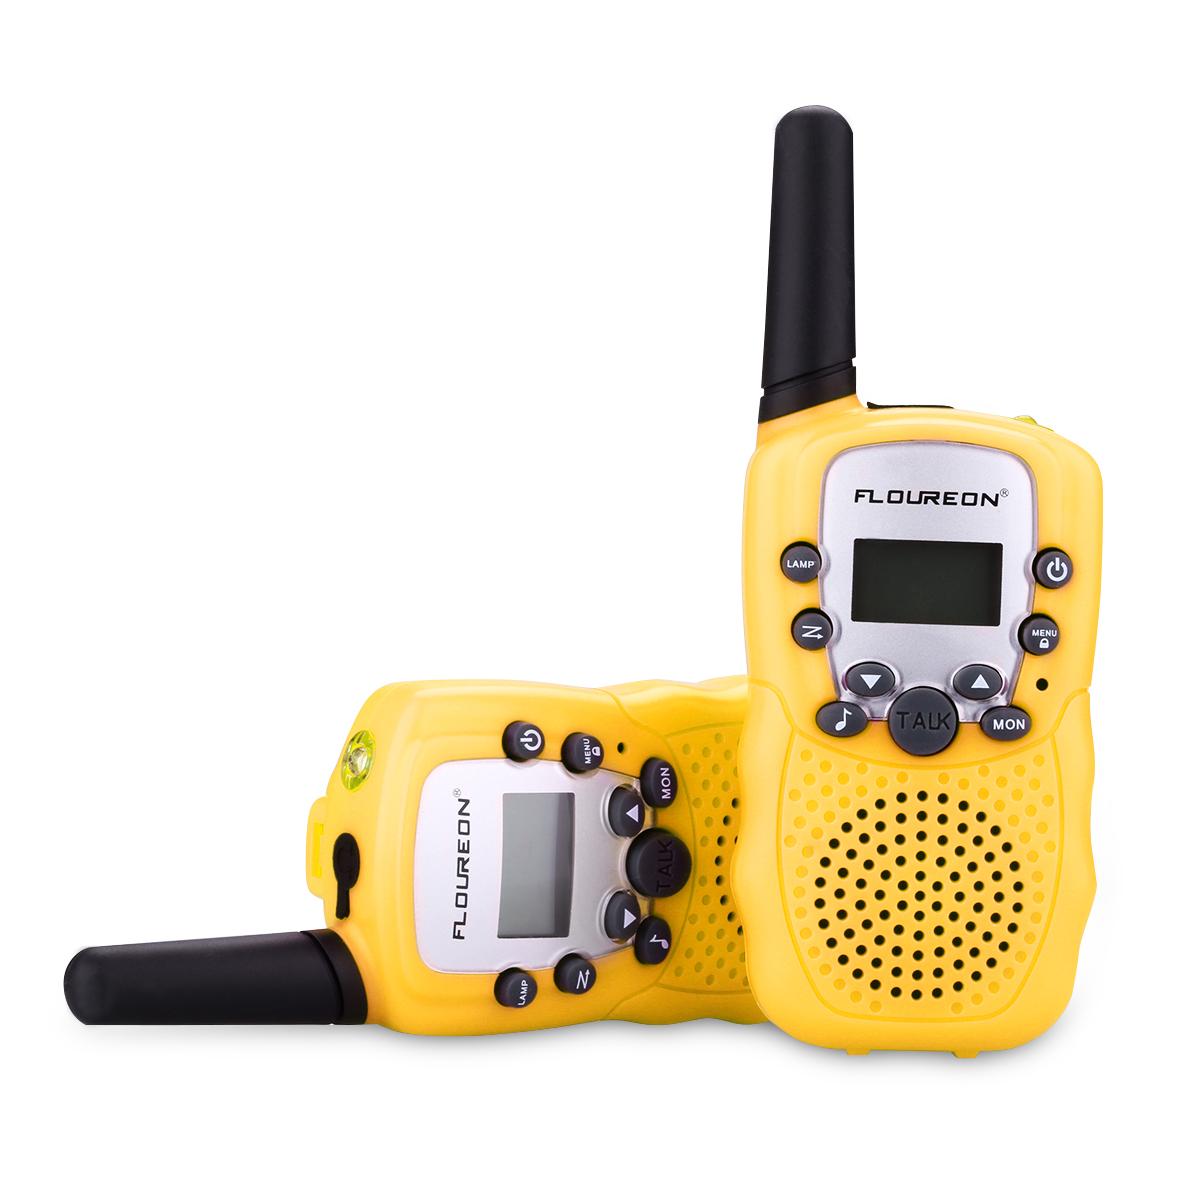 22 Channel Twin Walkie Talkies UHF462-467MHZ 2-Way Radio 5 Km Range Rechargeable